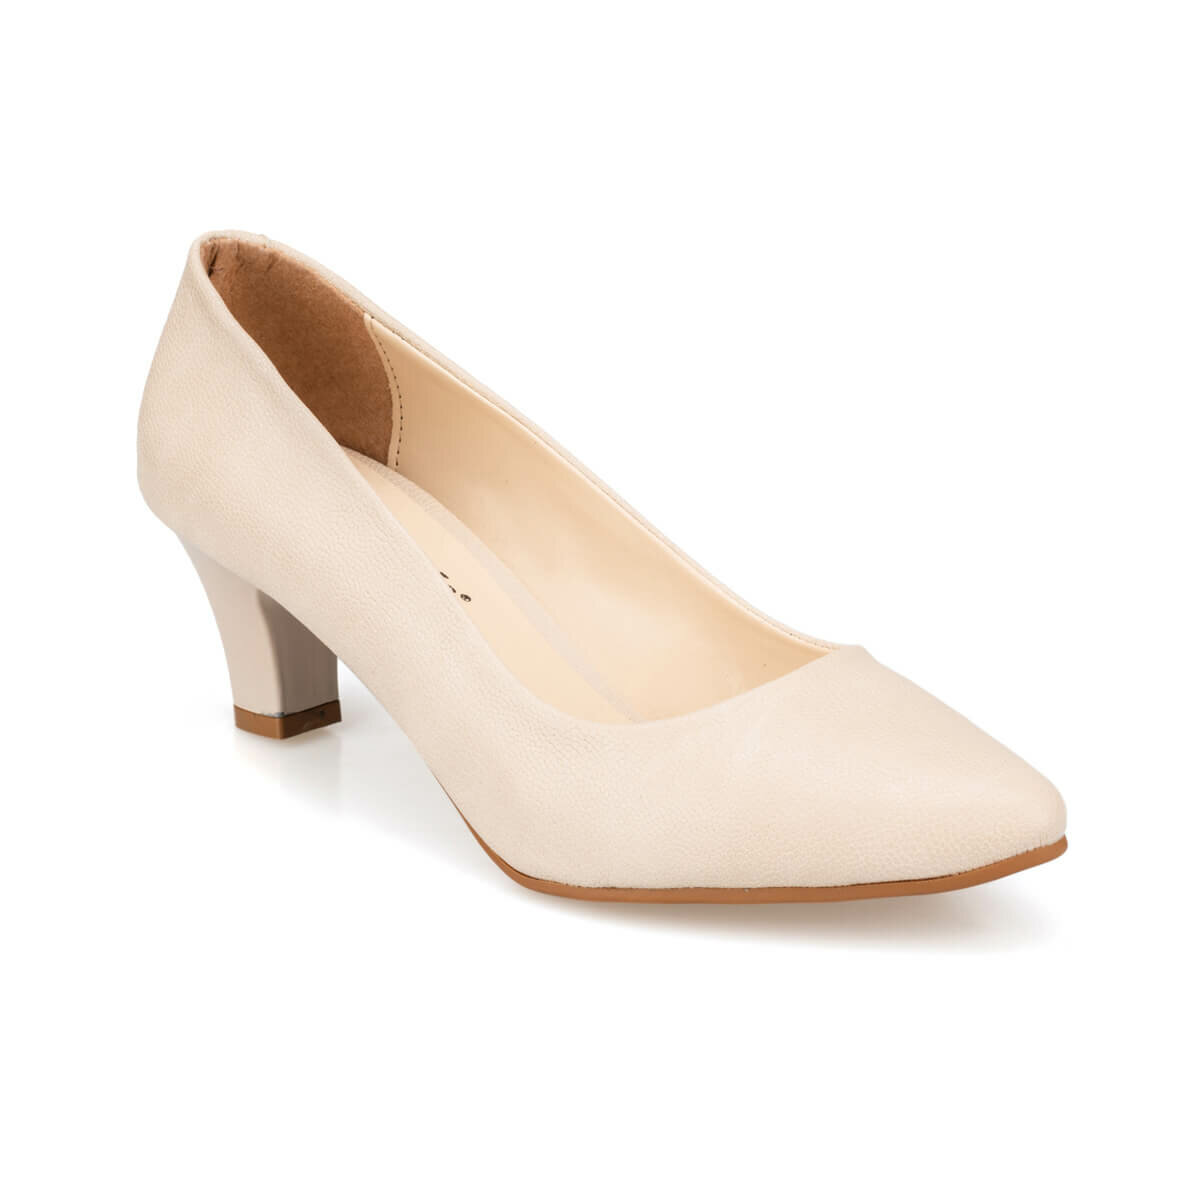 FLO 91.313101DZ Beige Women Gova Shoes Polaris